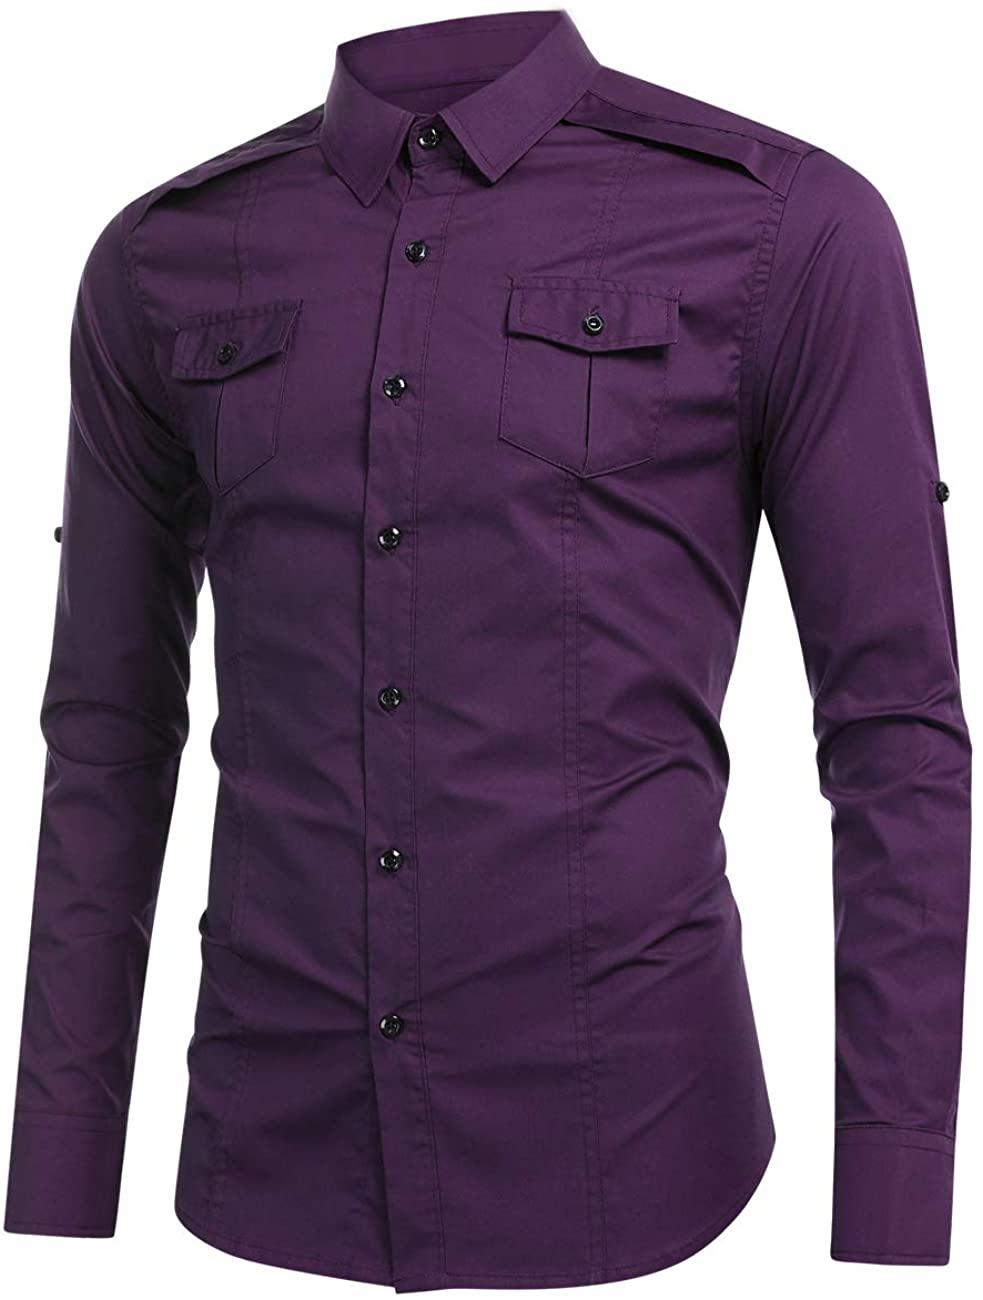 WESTECHO Men's Long-Sleeve Solid Cargo Work Shirt Formal Uniform Tops Convertible Industrial Work Shirts 2 Chest Pockets